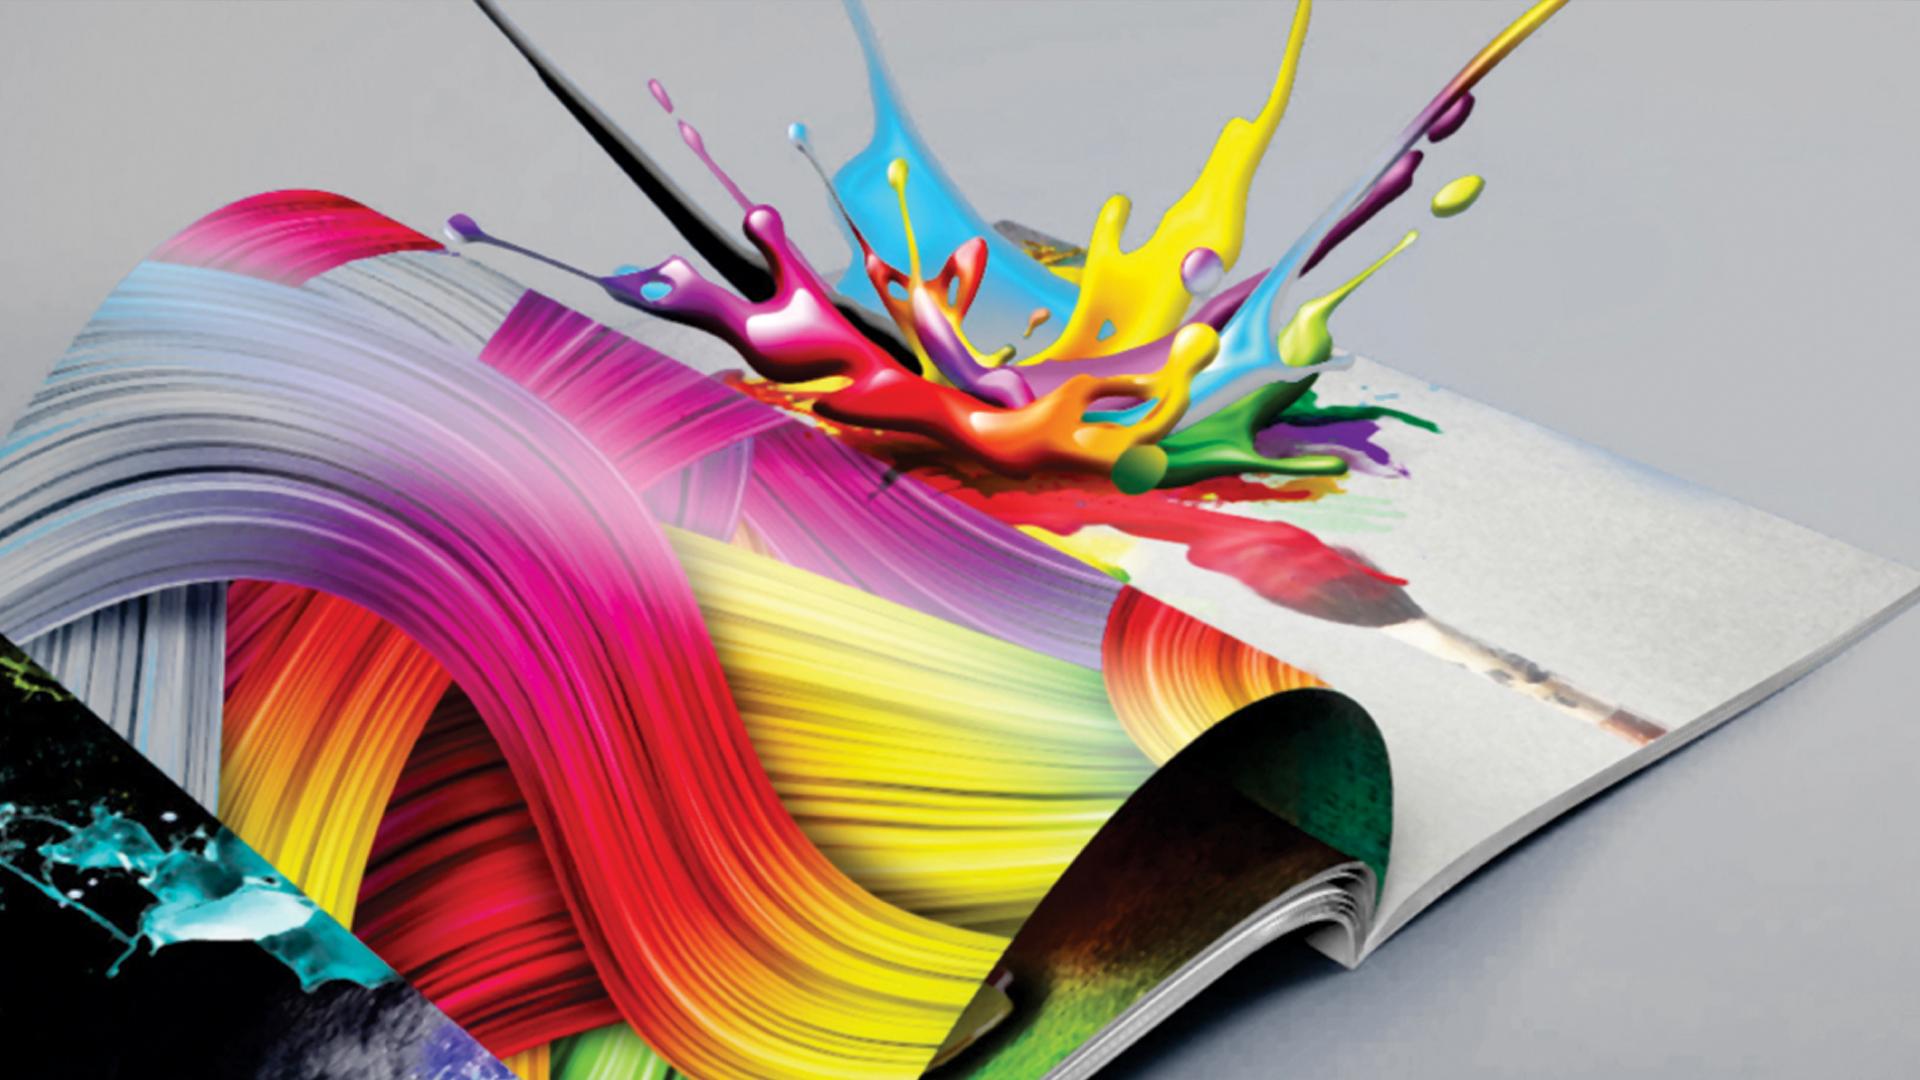 Digital-Printing-Companies-in-Ras-Al-Khaimah.jpg